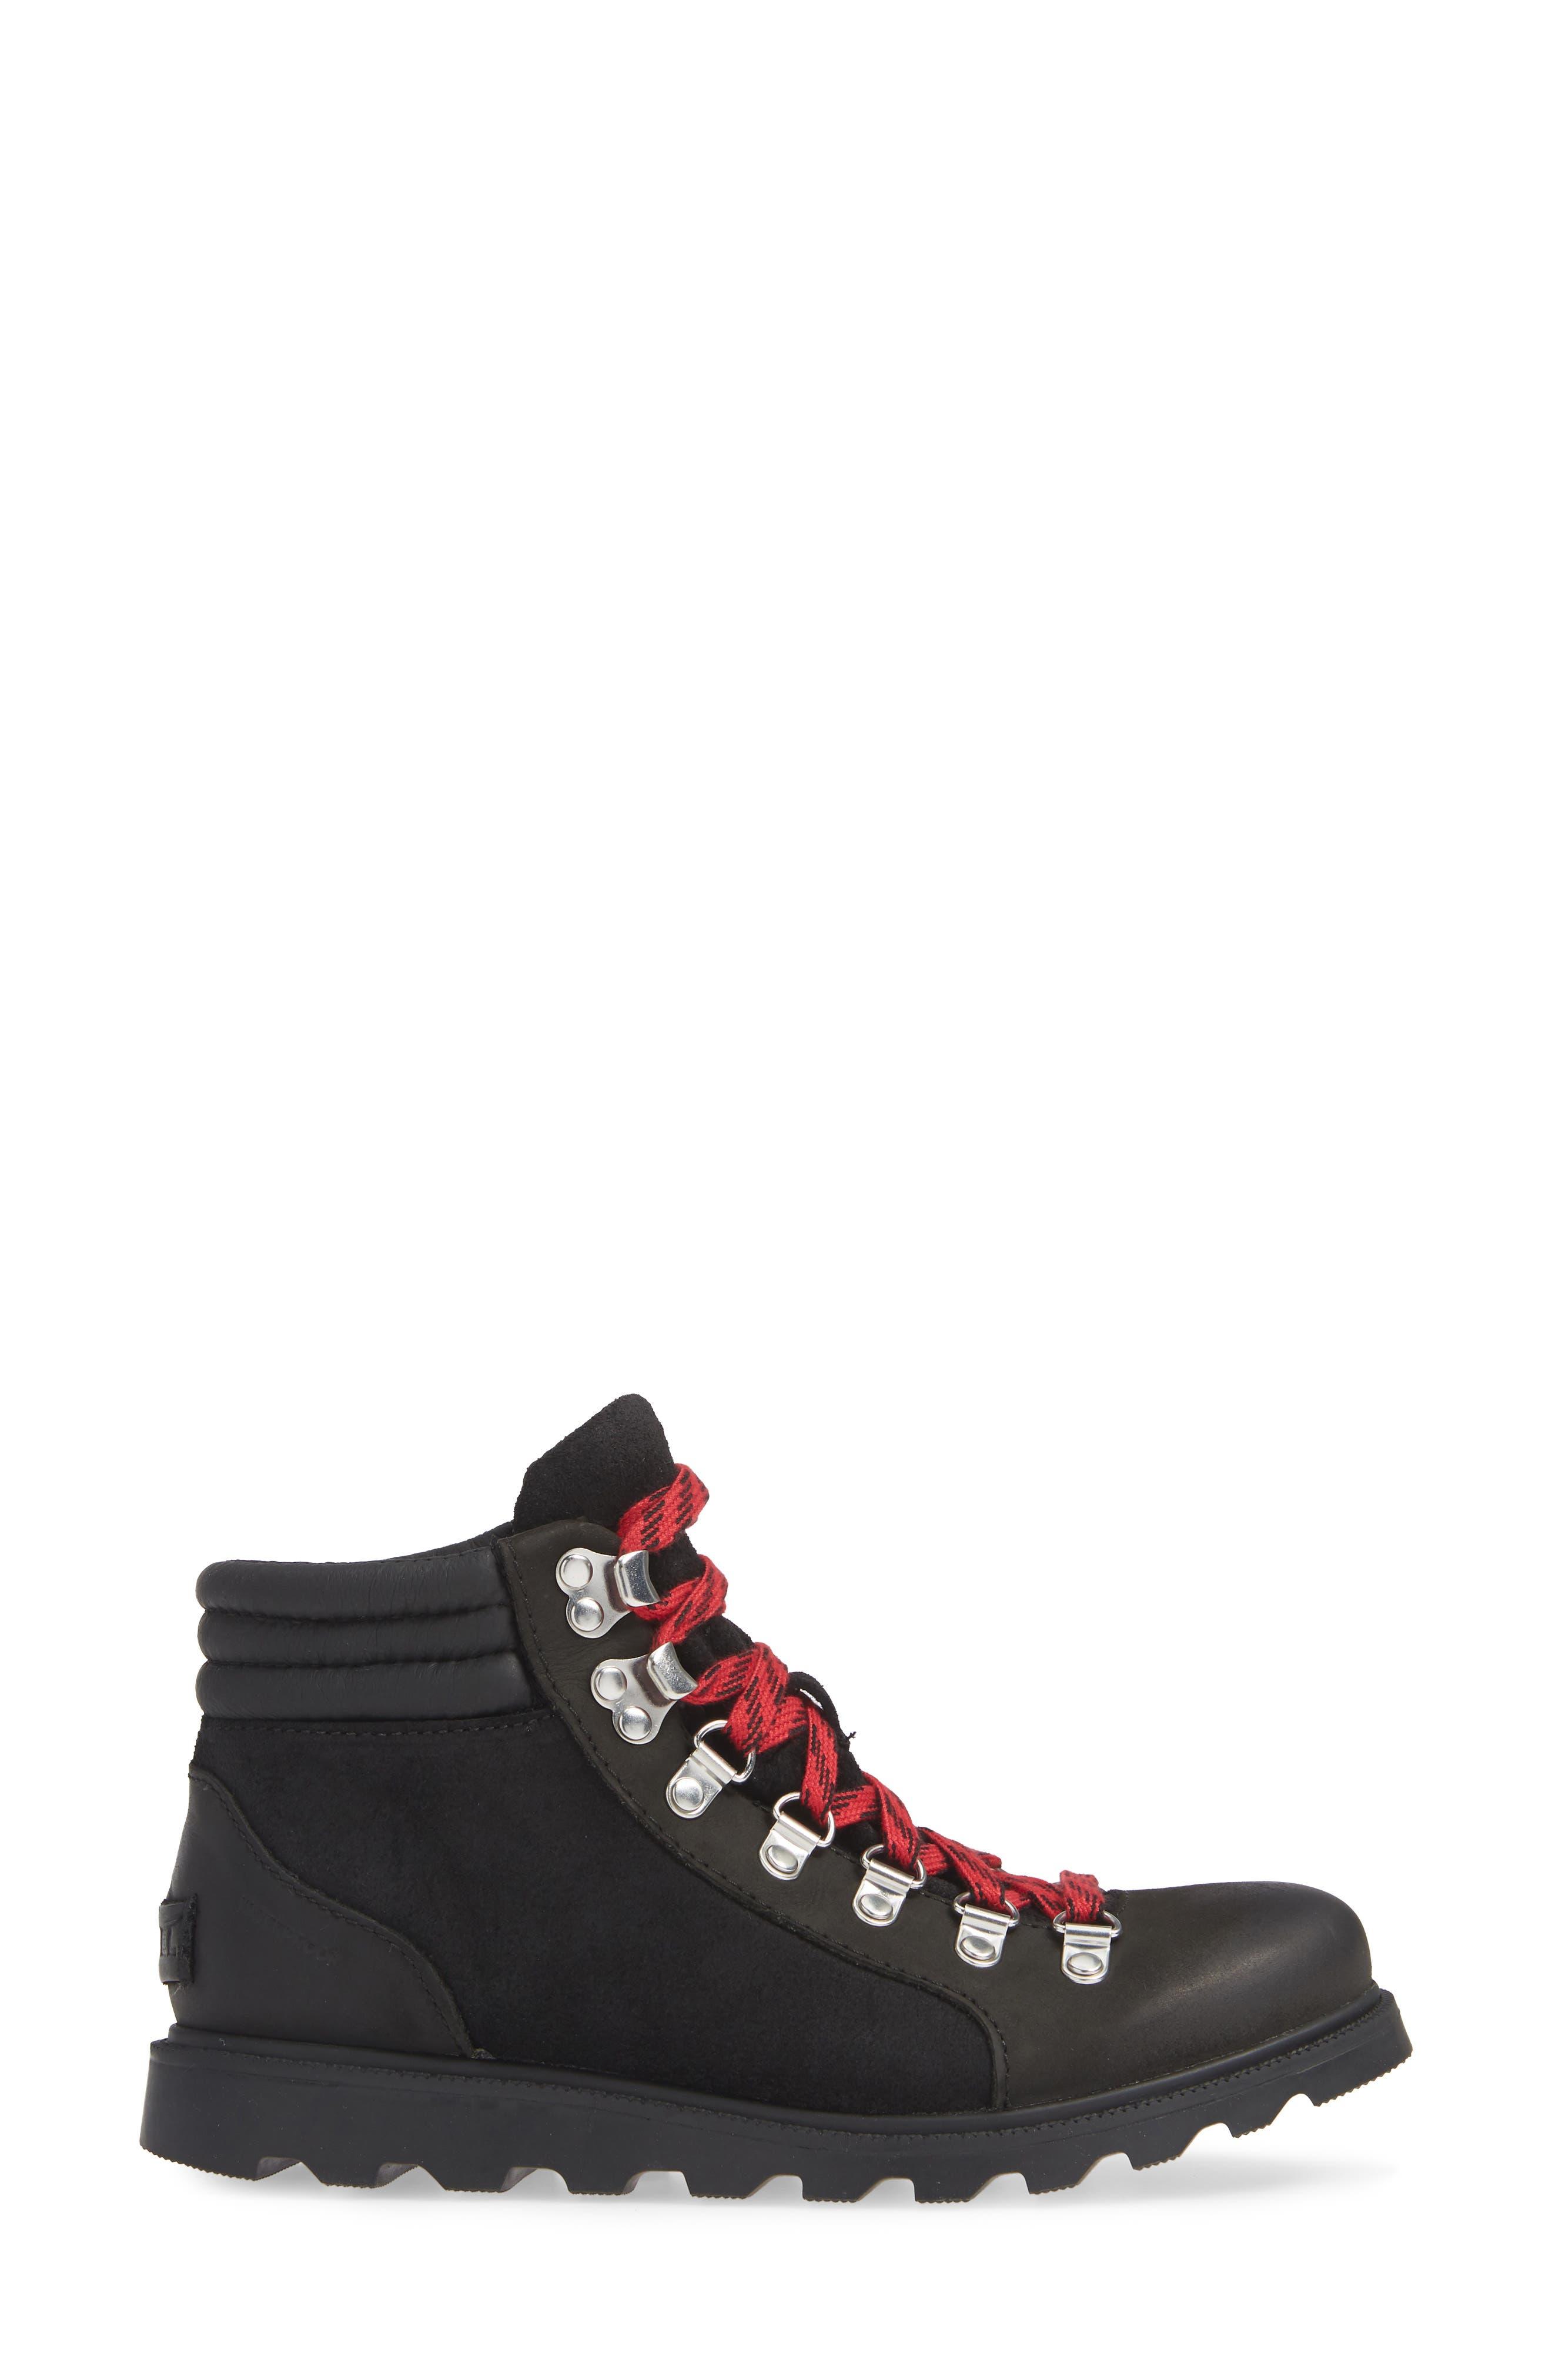 SOREL, Ainsley Conquest Waterproof Boot, Alternate thumbnail 3, color, BLACK/ BLACK